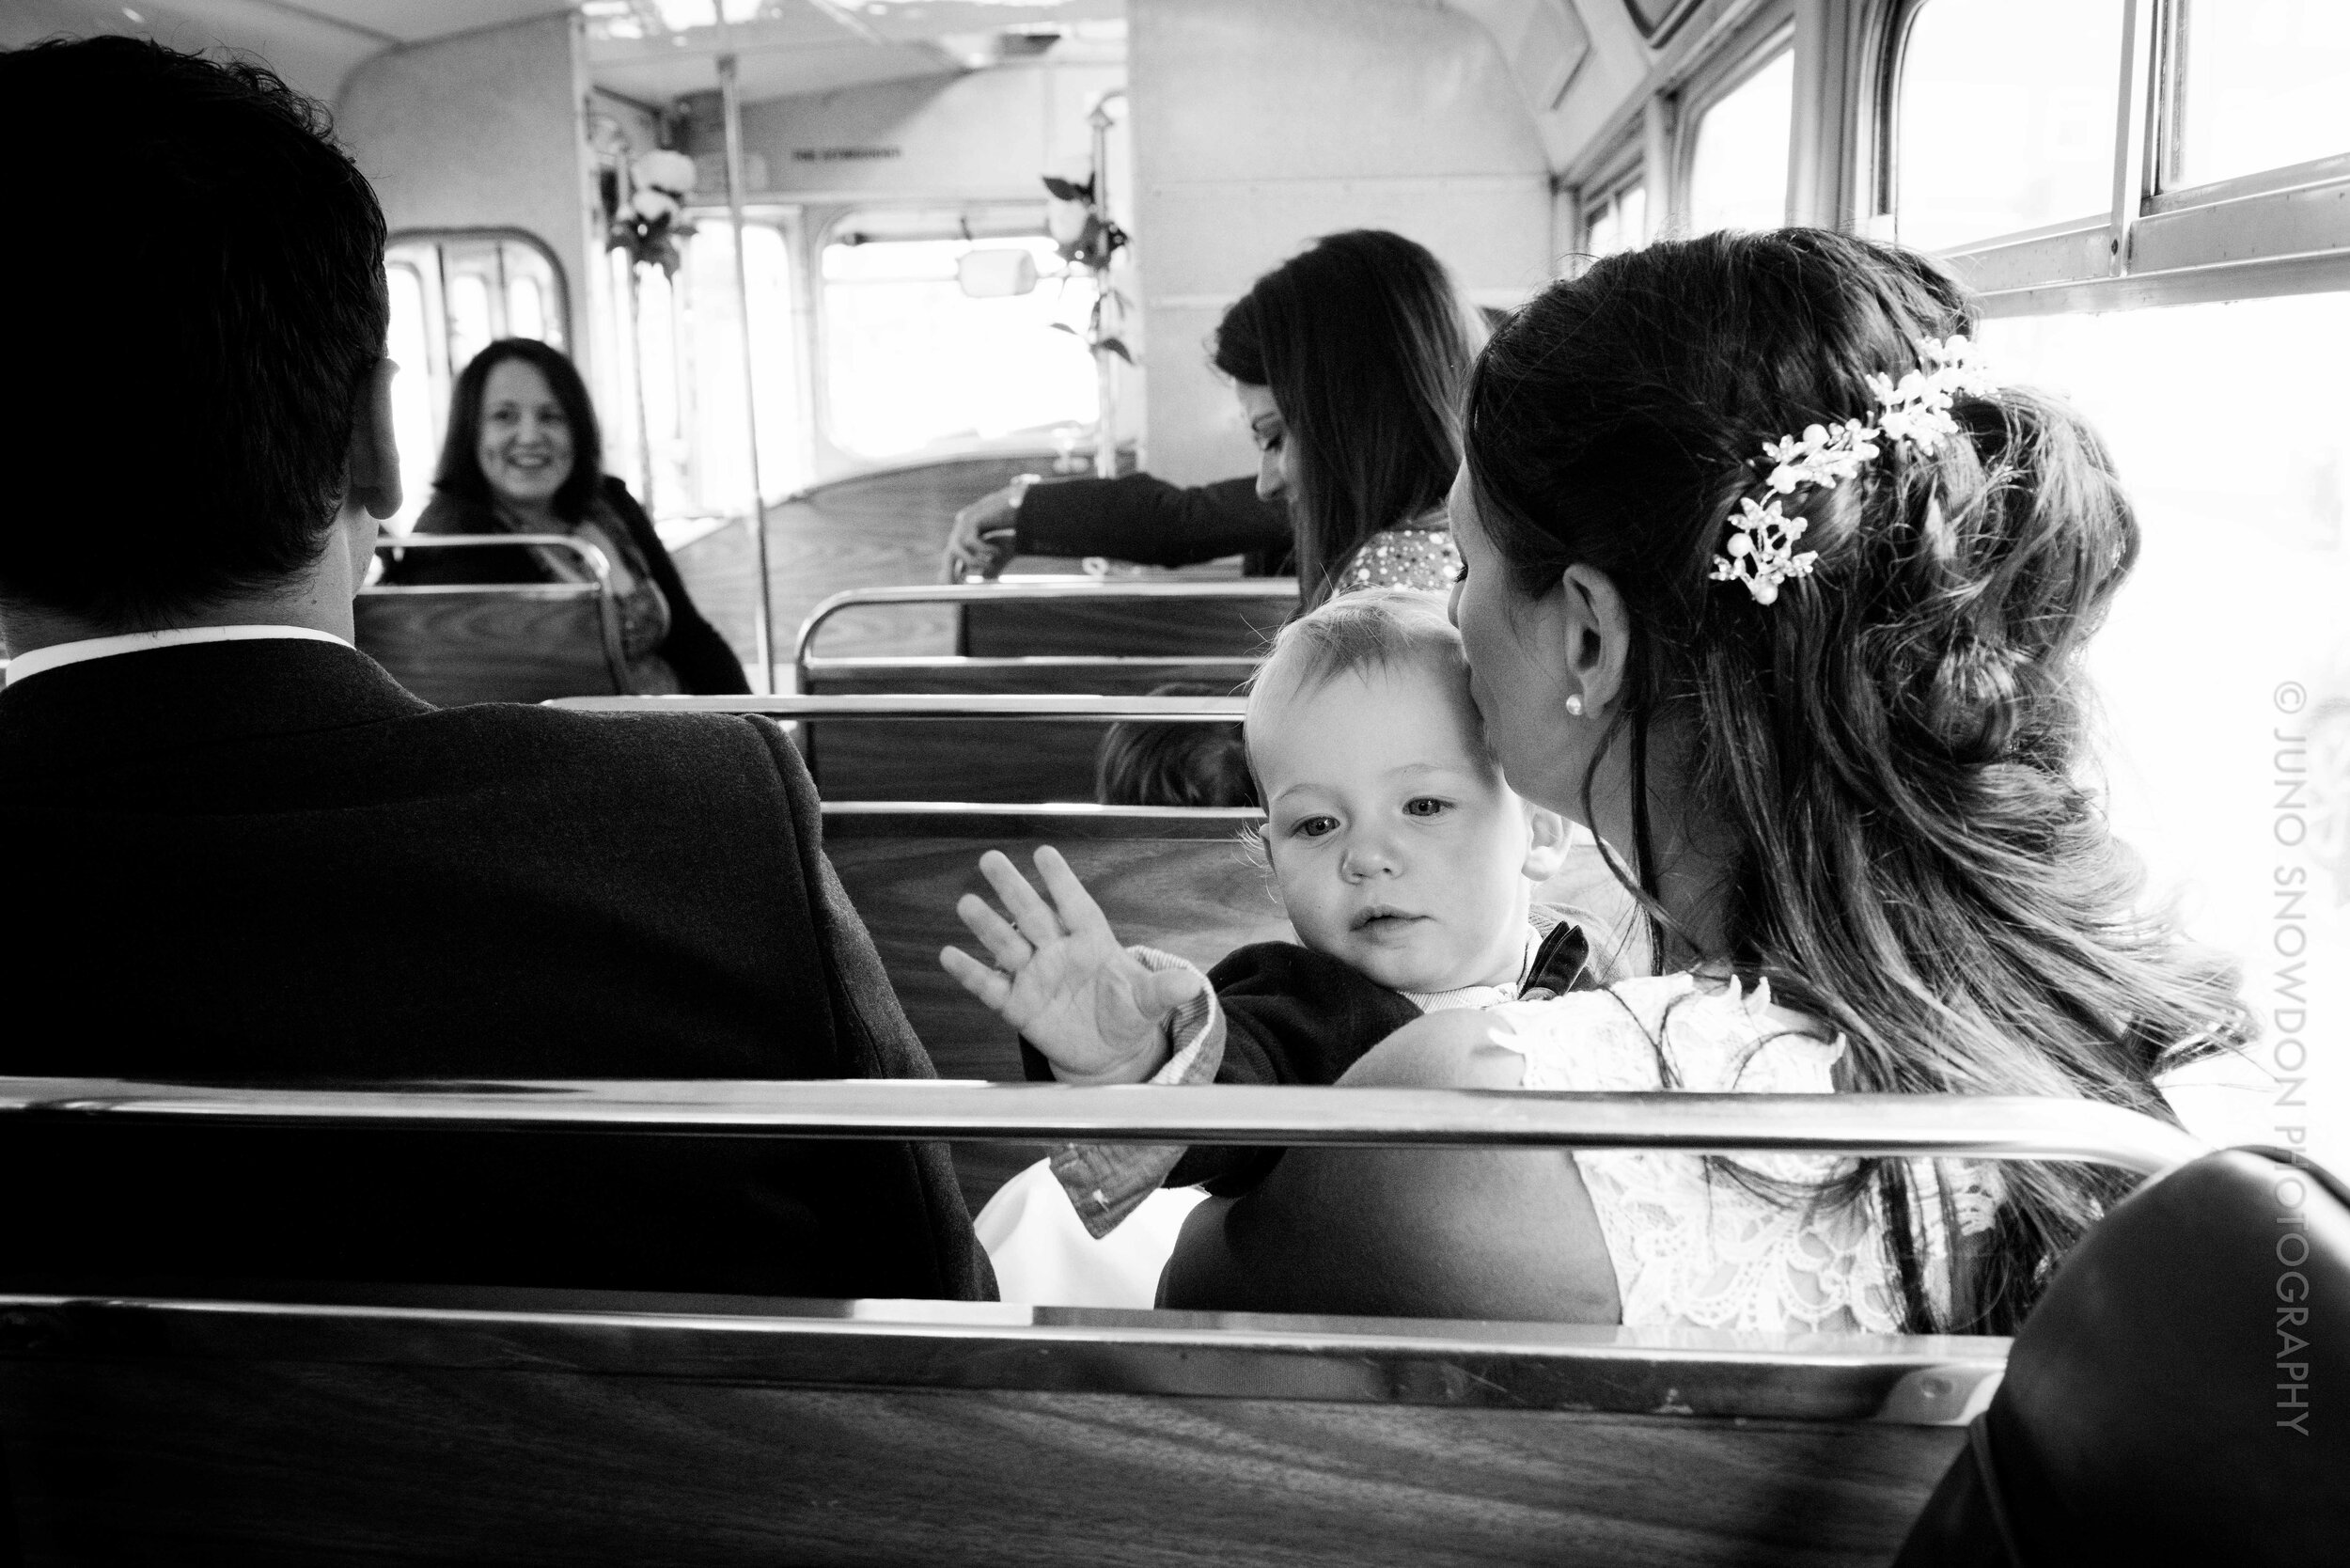 juno-snowdon-photography-wedding-7841.jpg